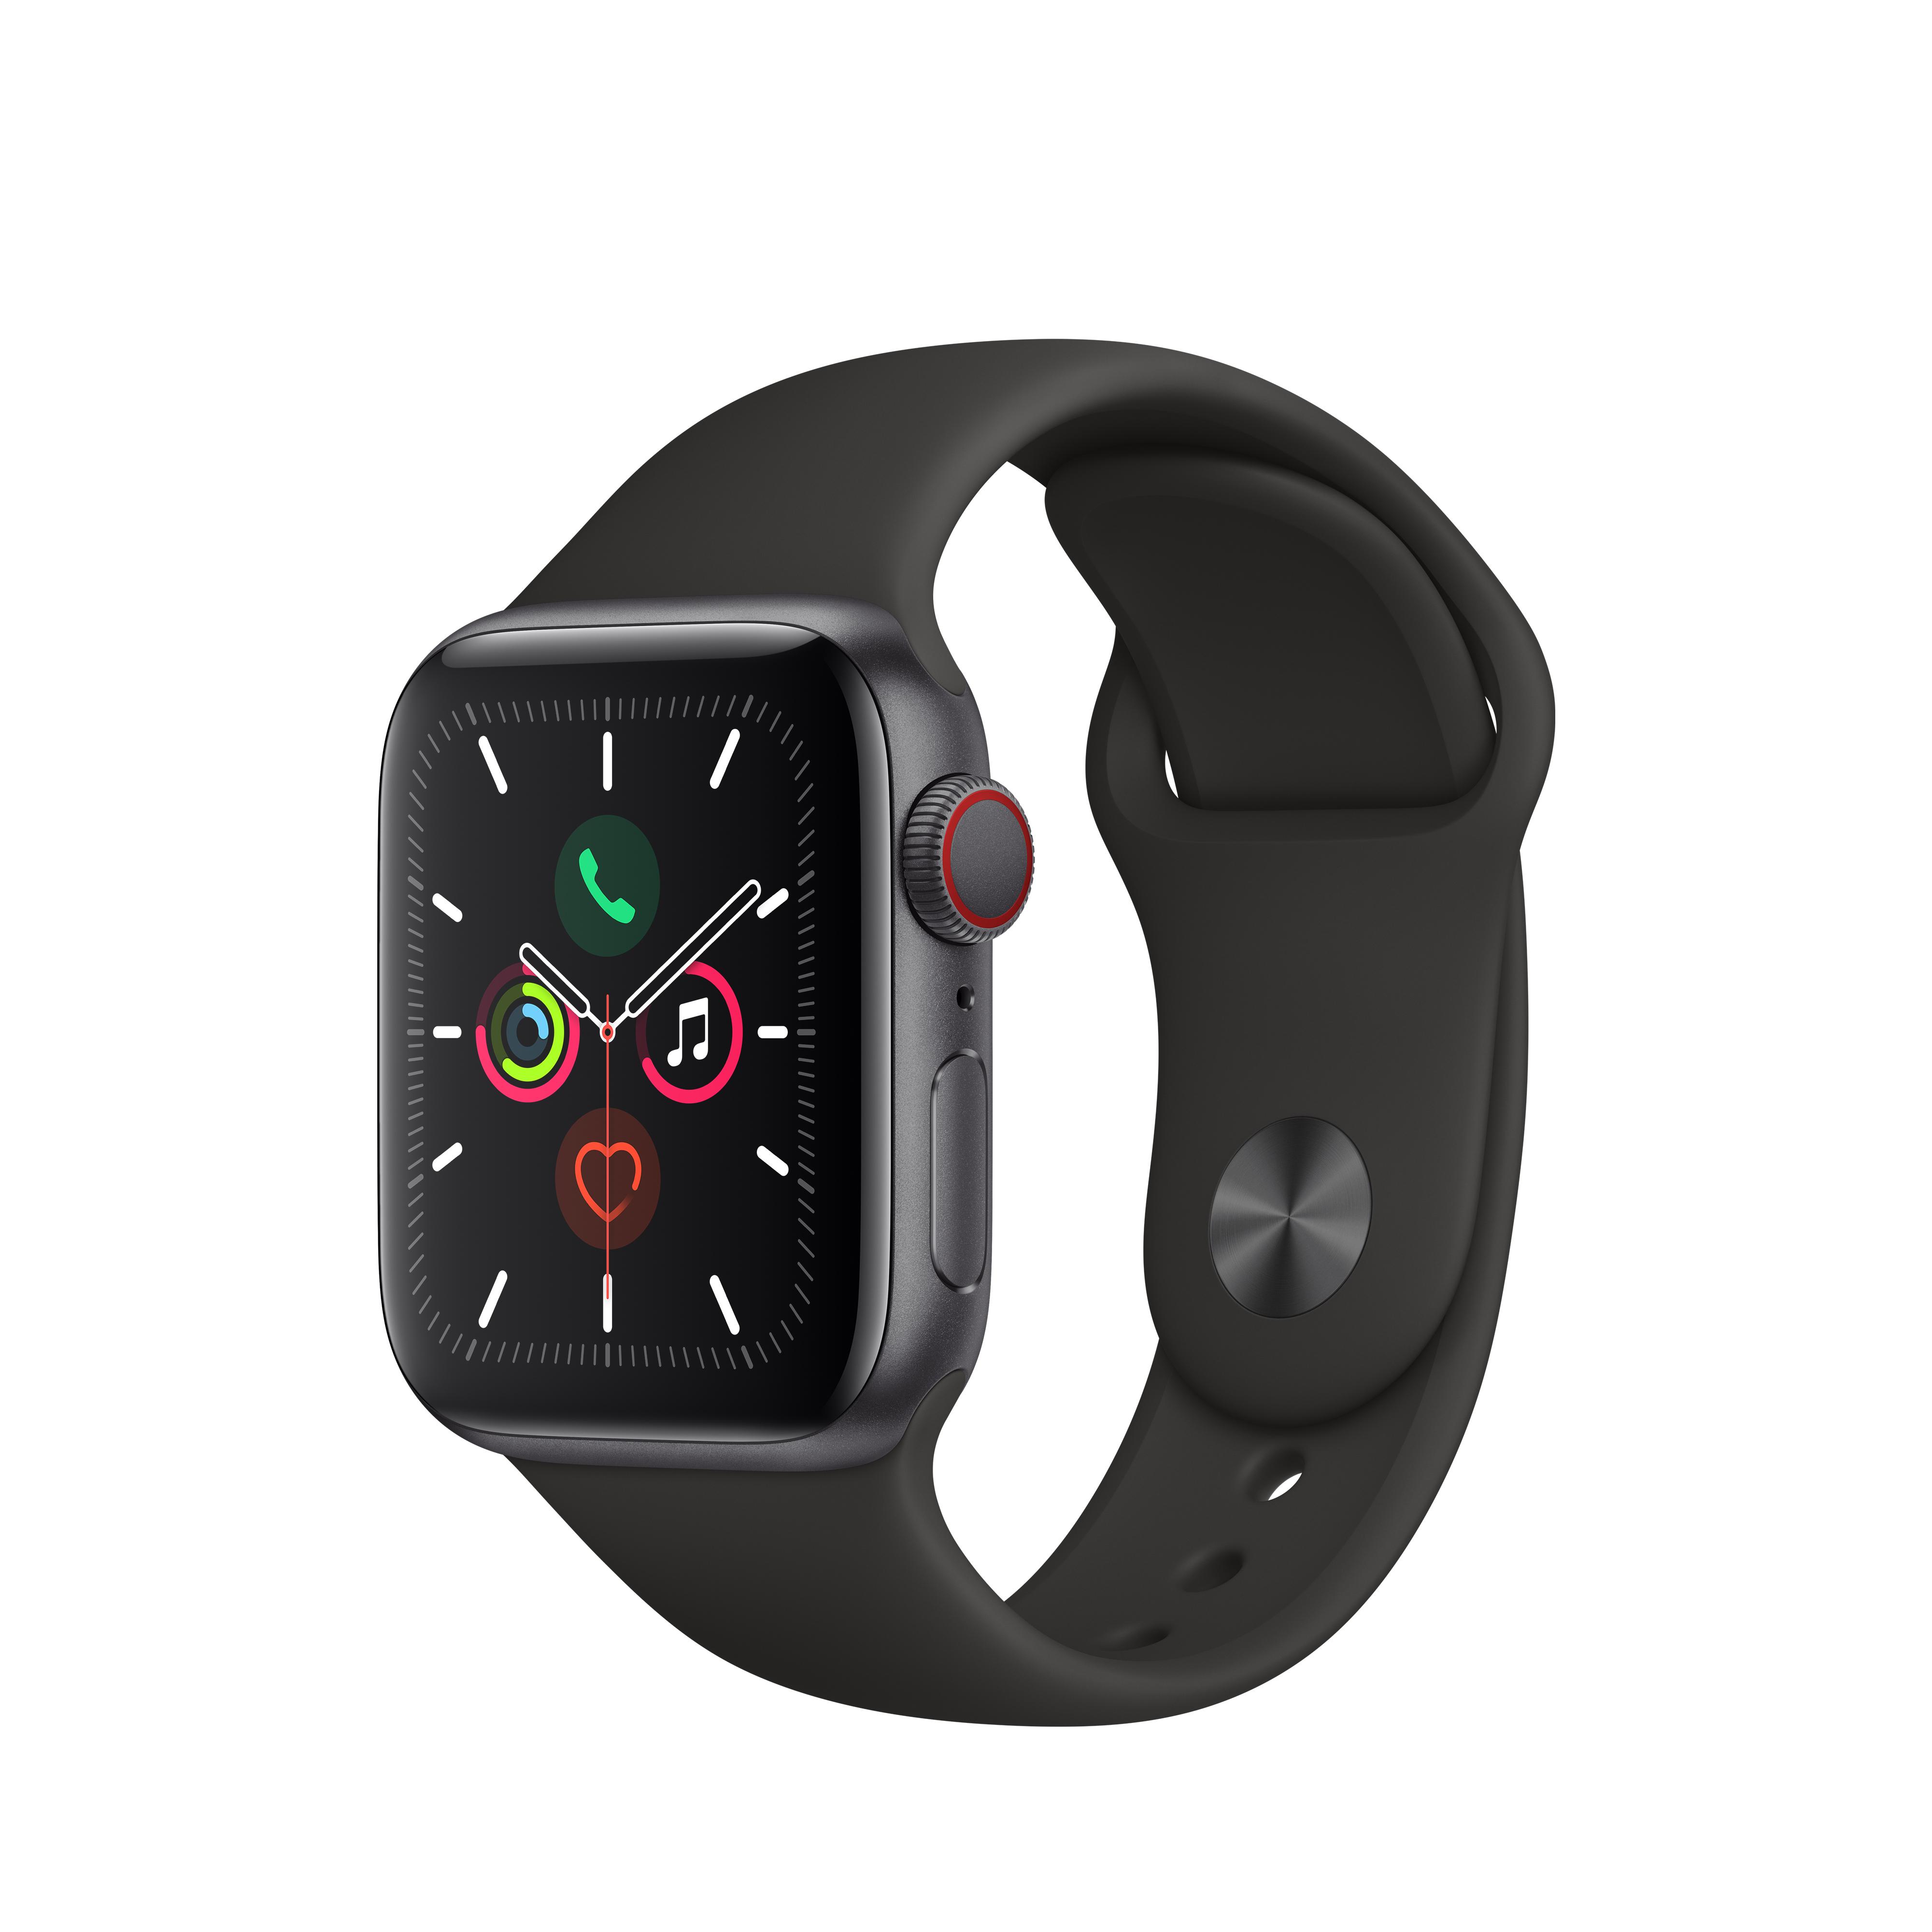 Apple 애플워치5 GPS + 셀룰러 40mm 스포츠밴드 + 알루미늄케이스, 스페이스 그레이(MWX32KH/A), 블랙(밴드)